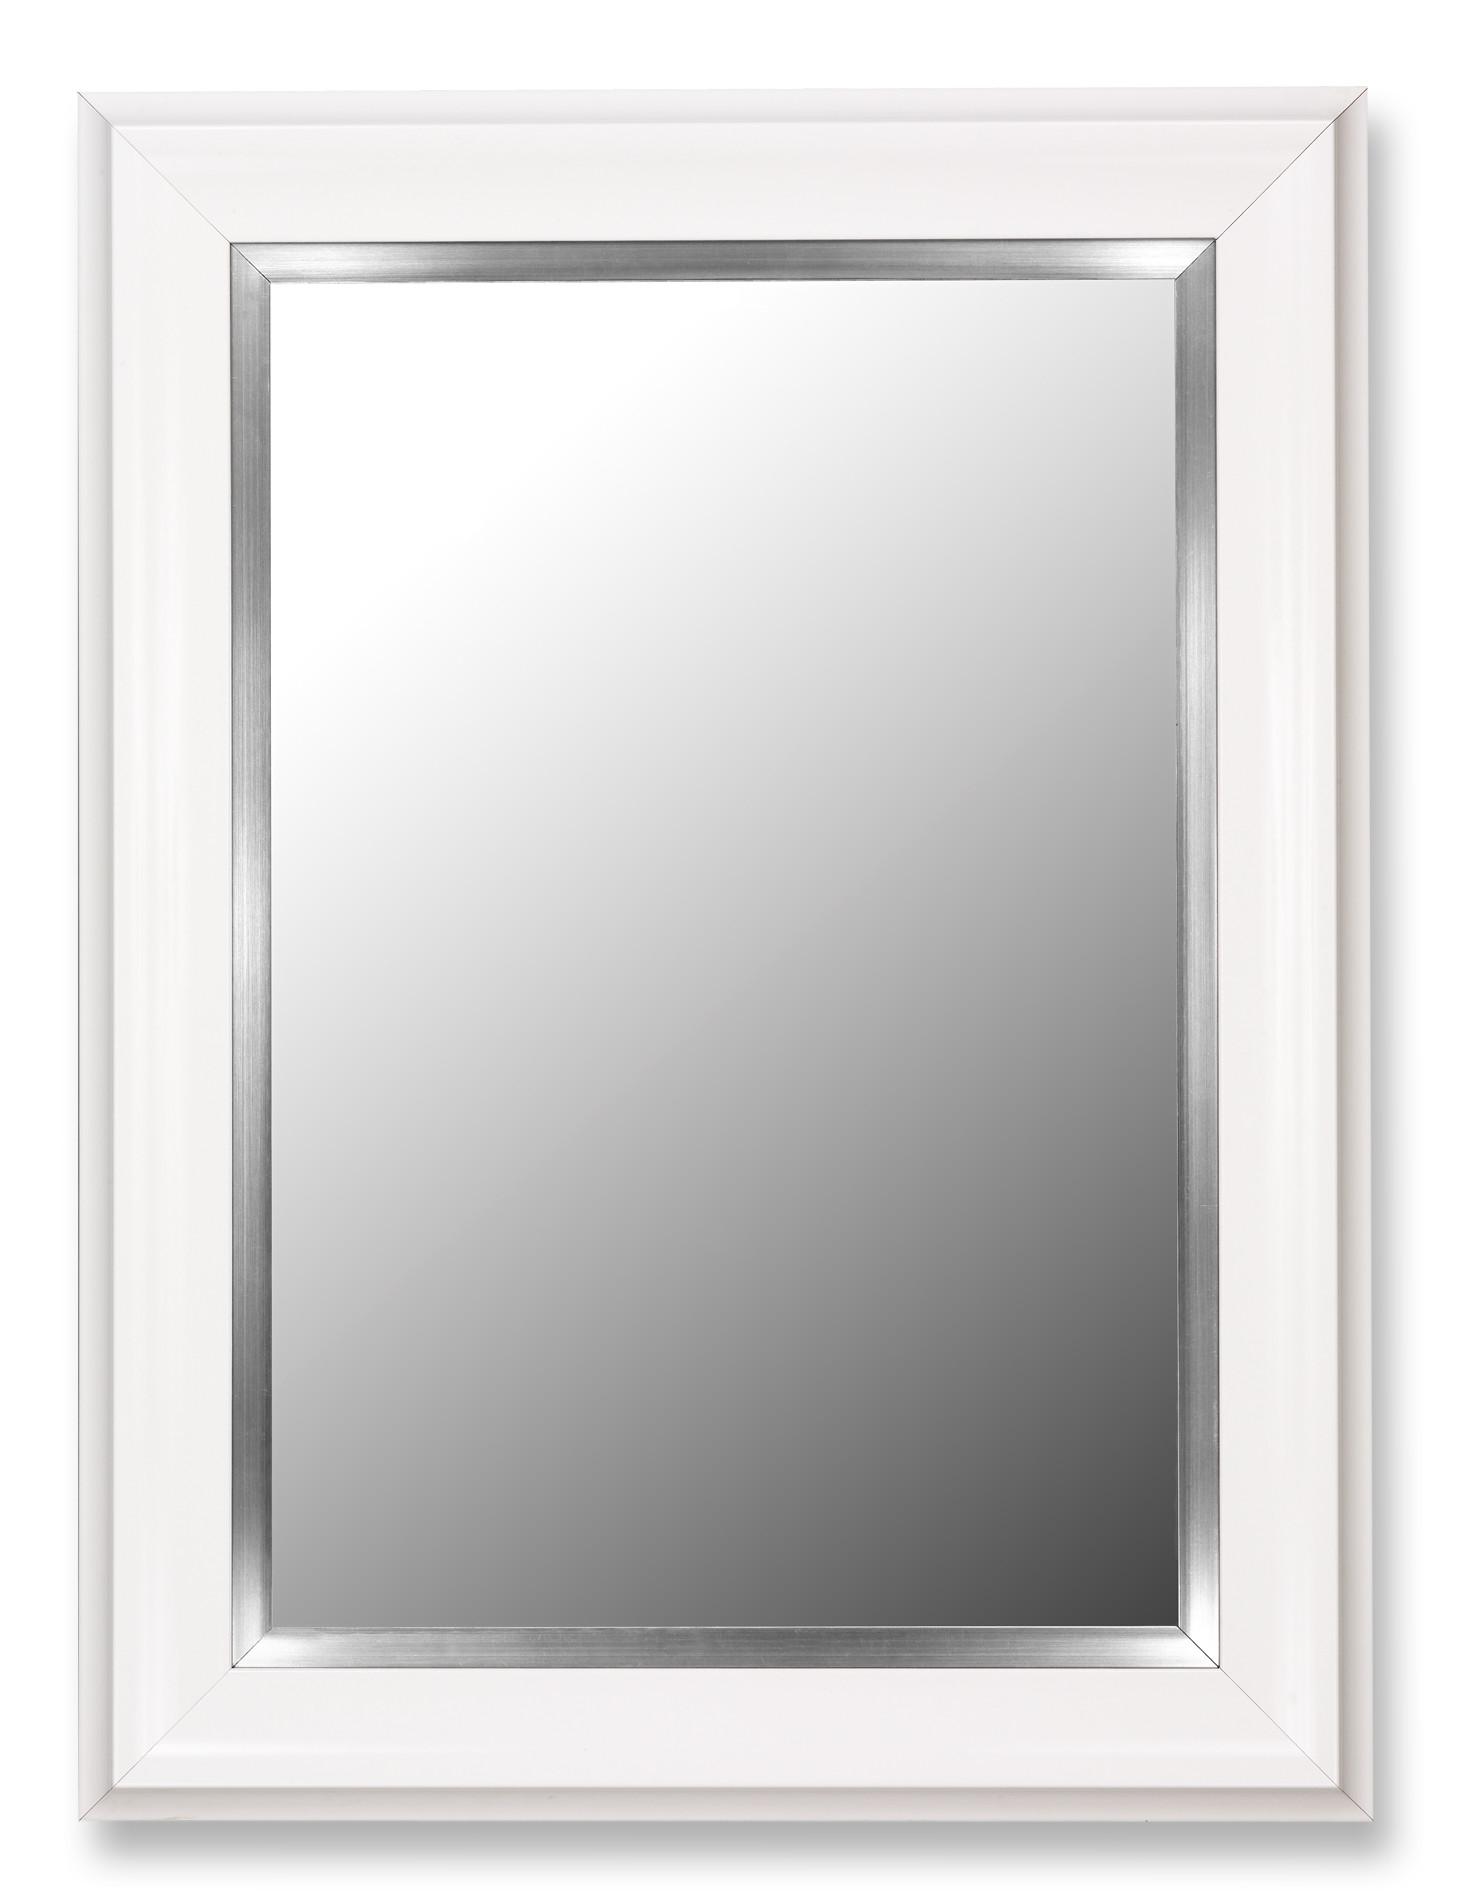 White Framed Mirror  39 H x 78 W - $730  Need 1